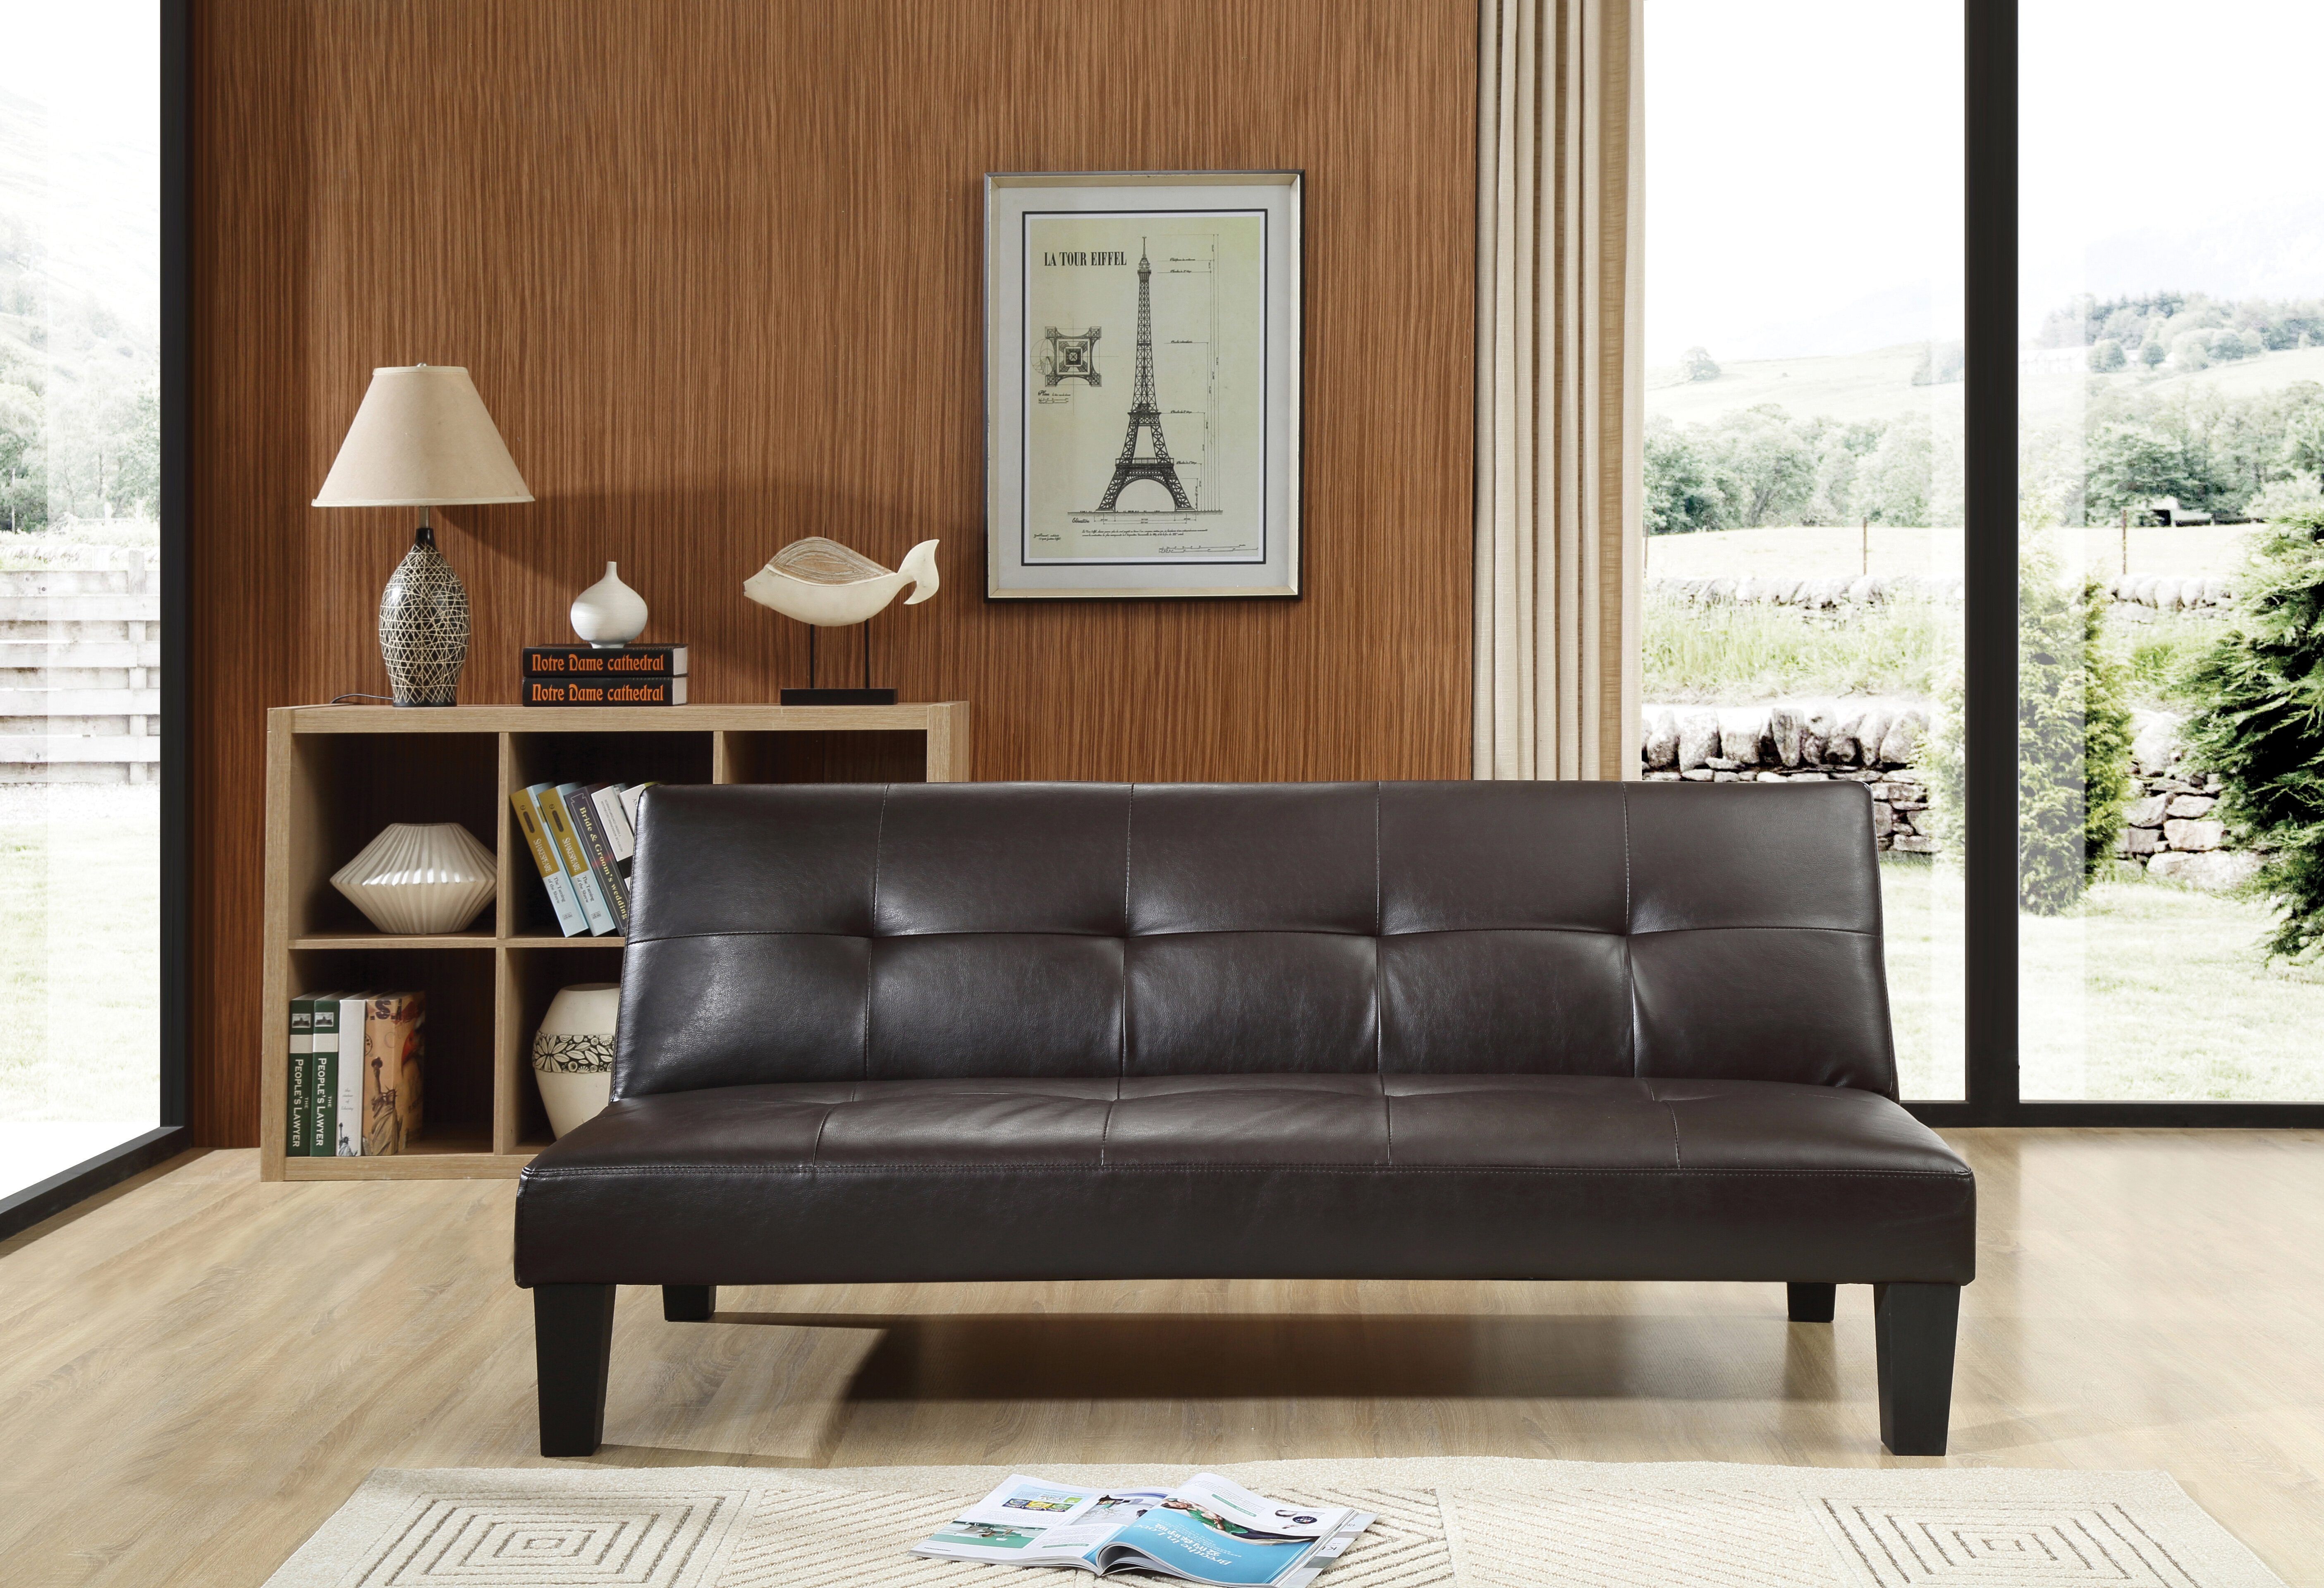 Brilliant Chavez Convertible Sleeper Sofa Home Remodeling Inspirations Cosmcuboardxyz